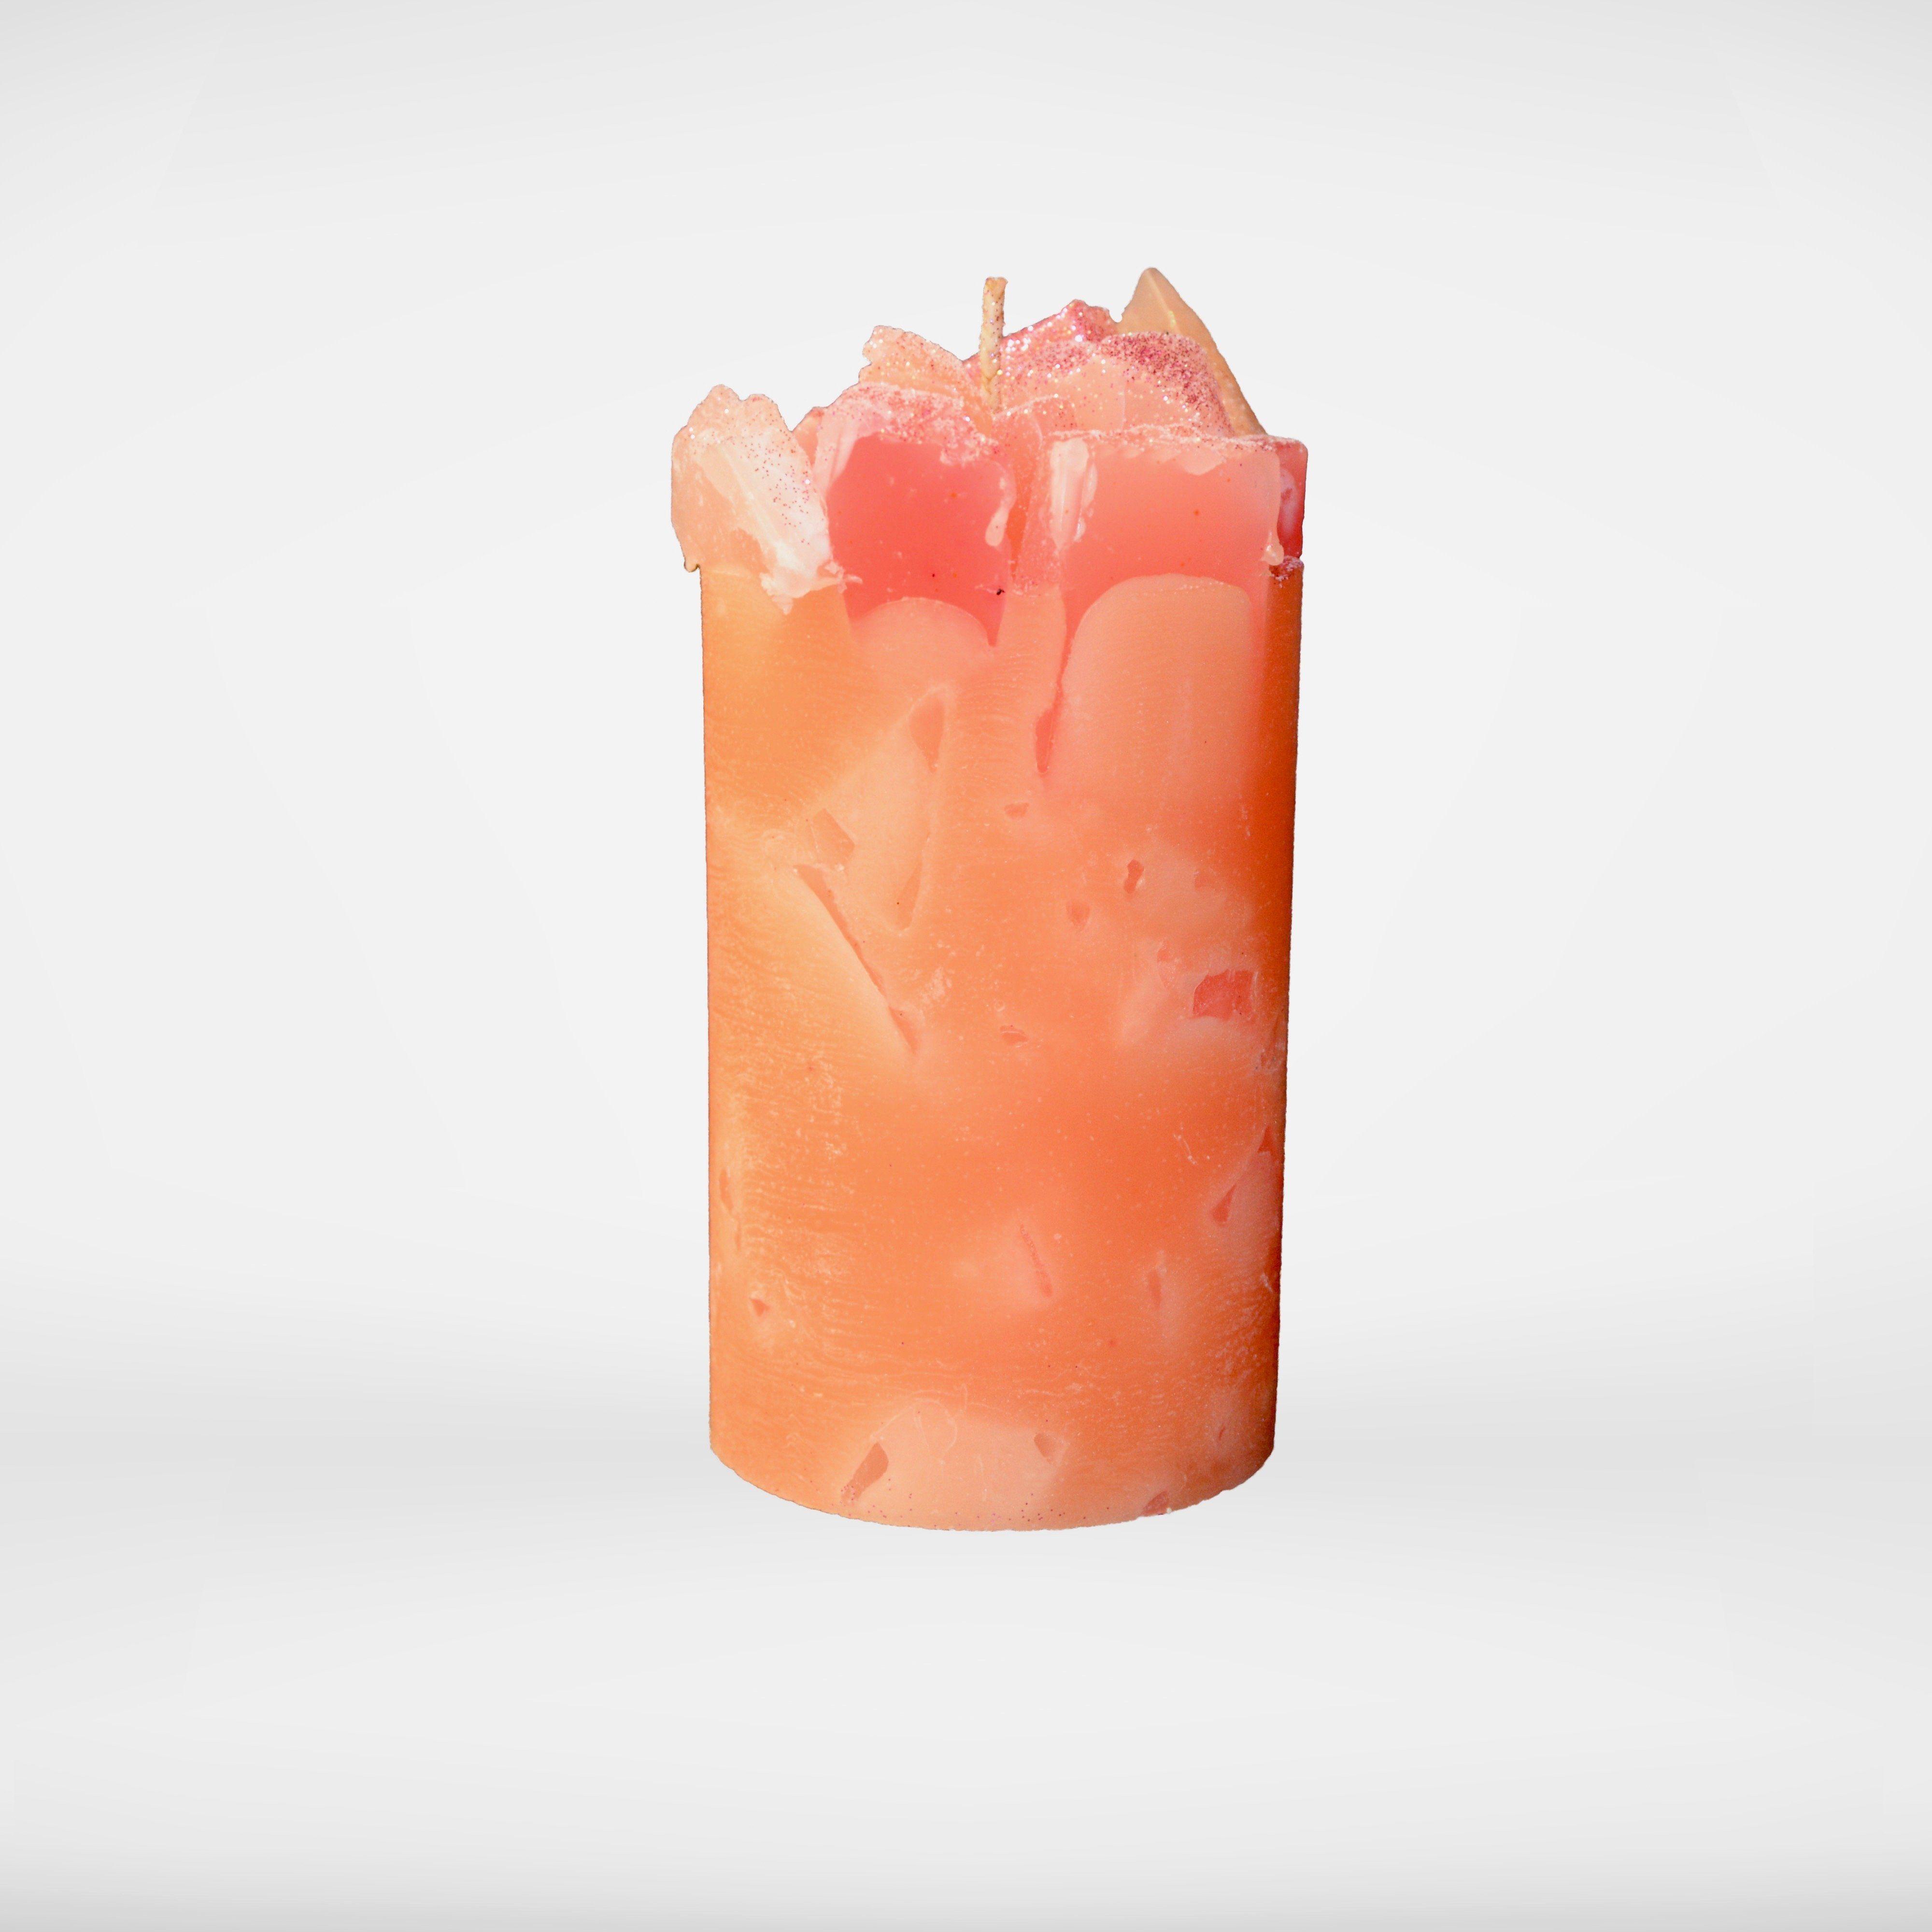 Georgia Peach Scented Candle | Mara | Pinterest | Peach on